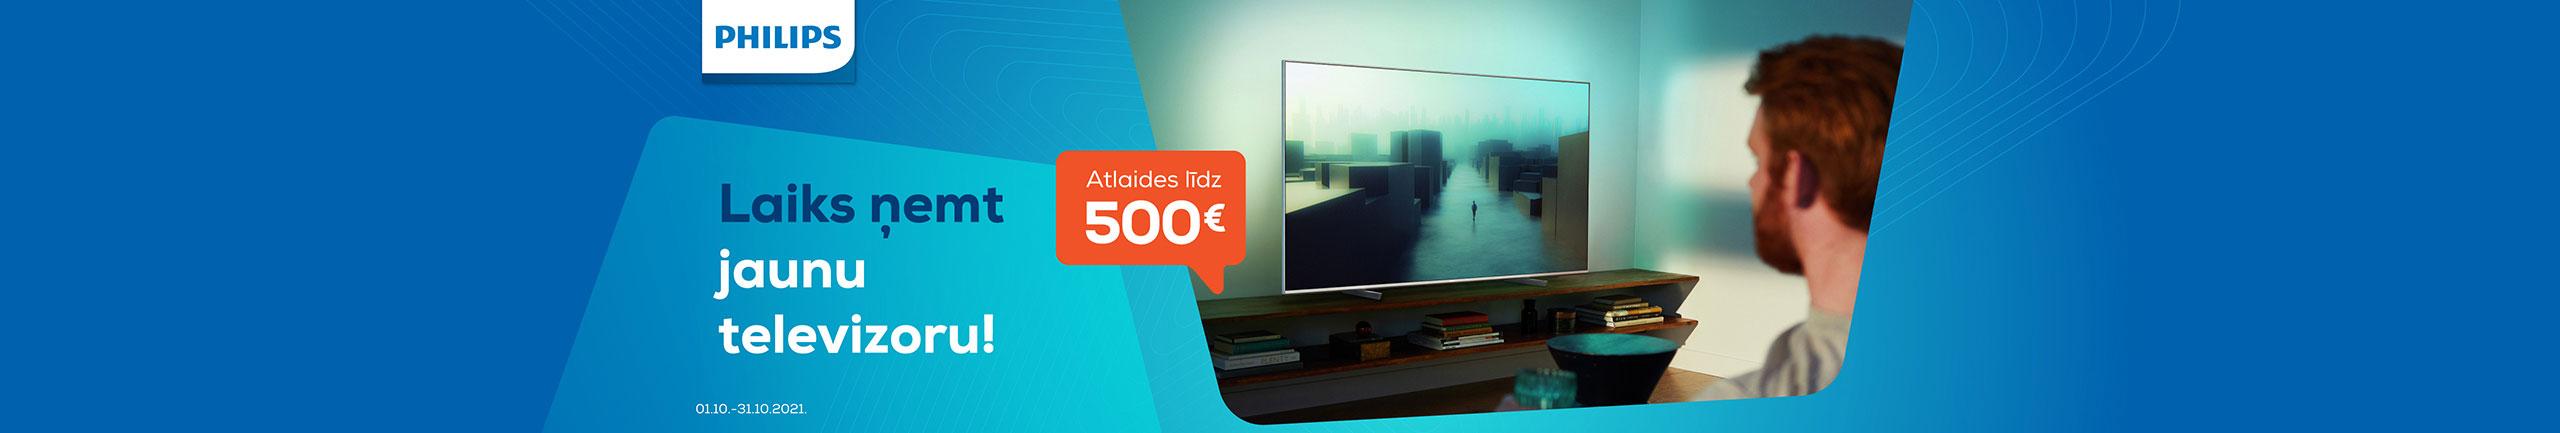 GR Philips TV